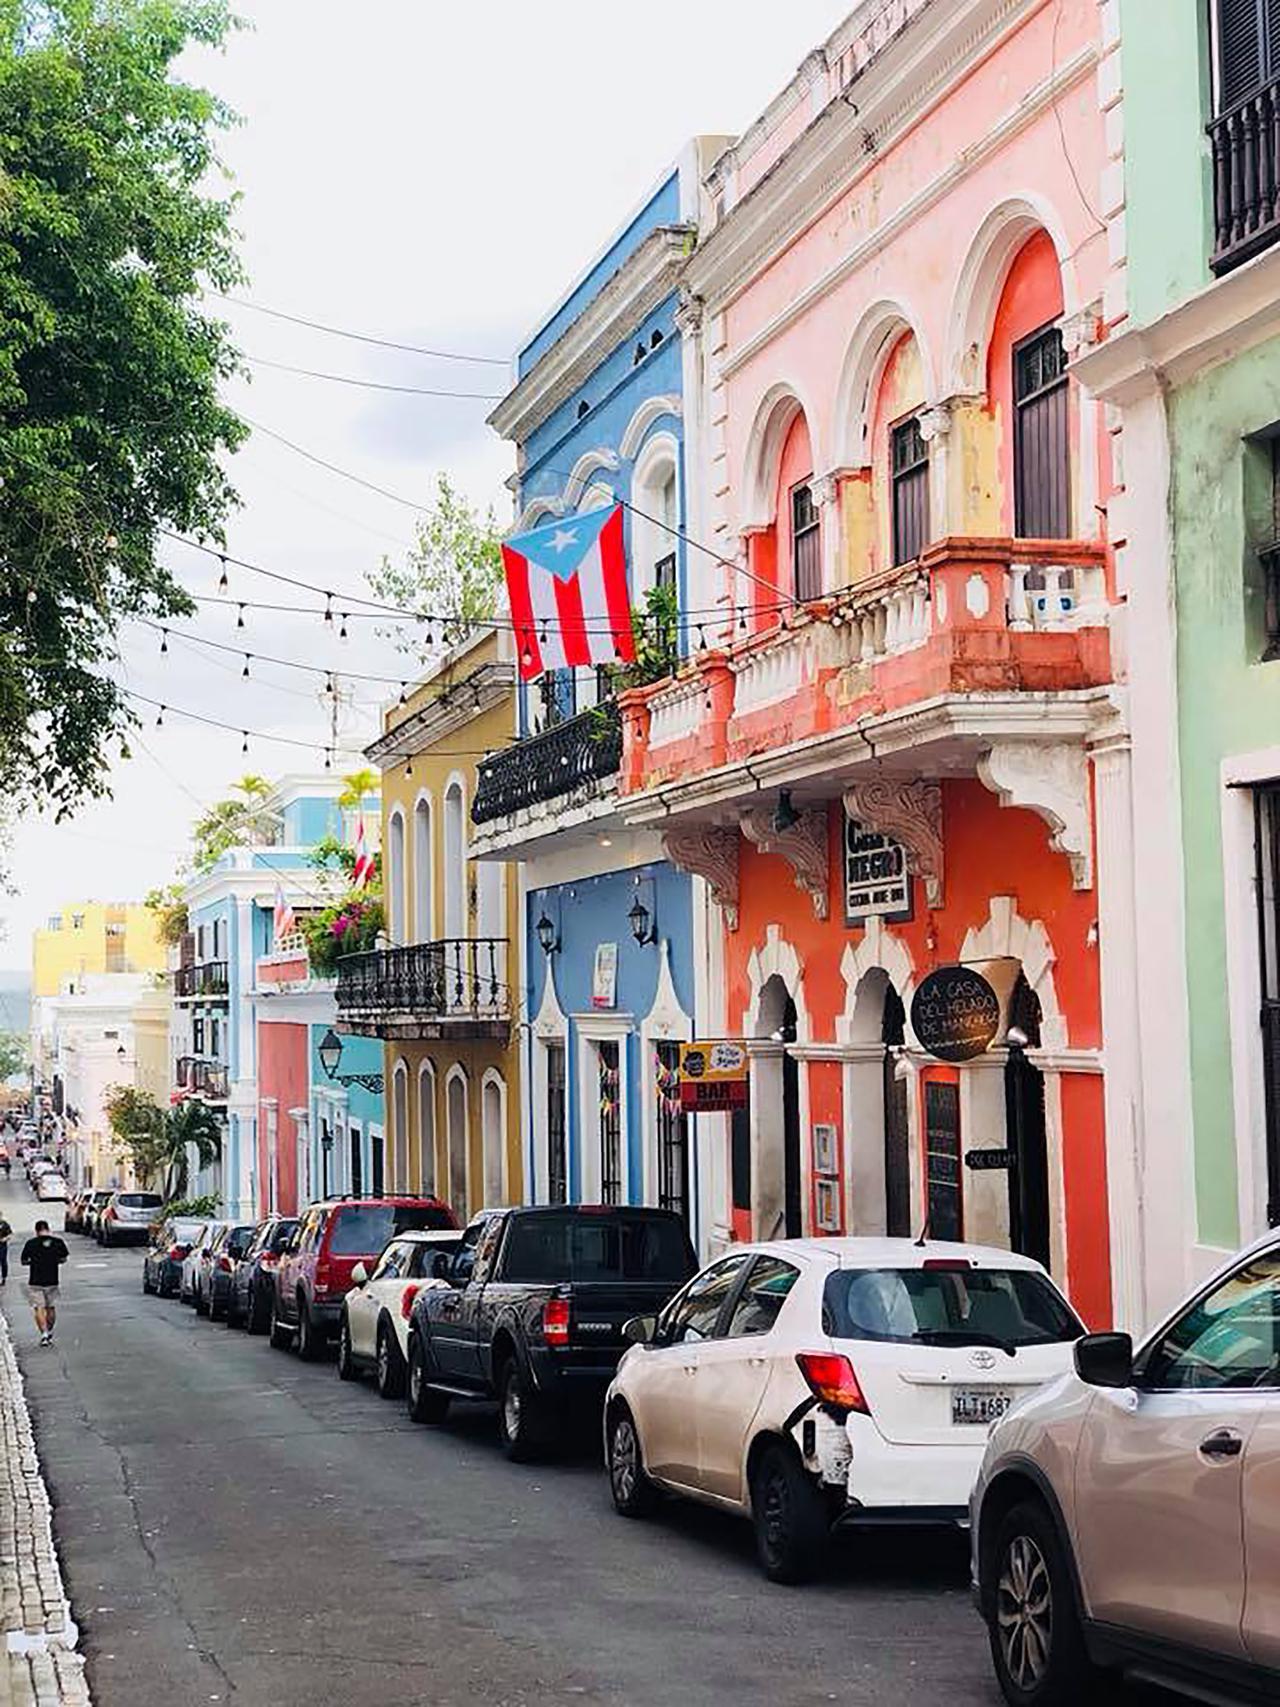 Puerto Rico -- No passport nor Covid test needed!